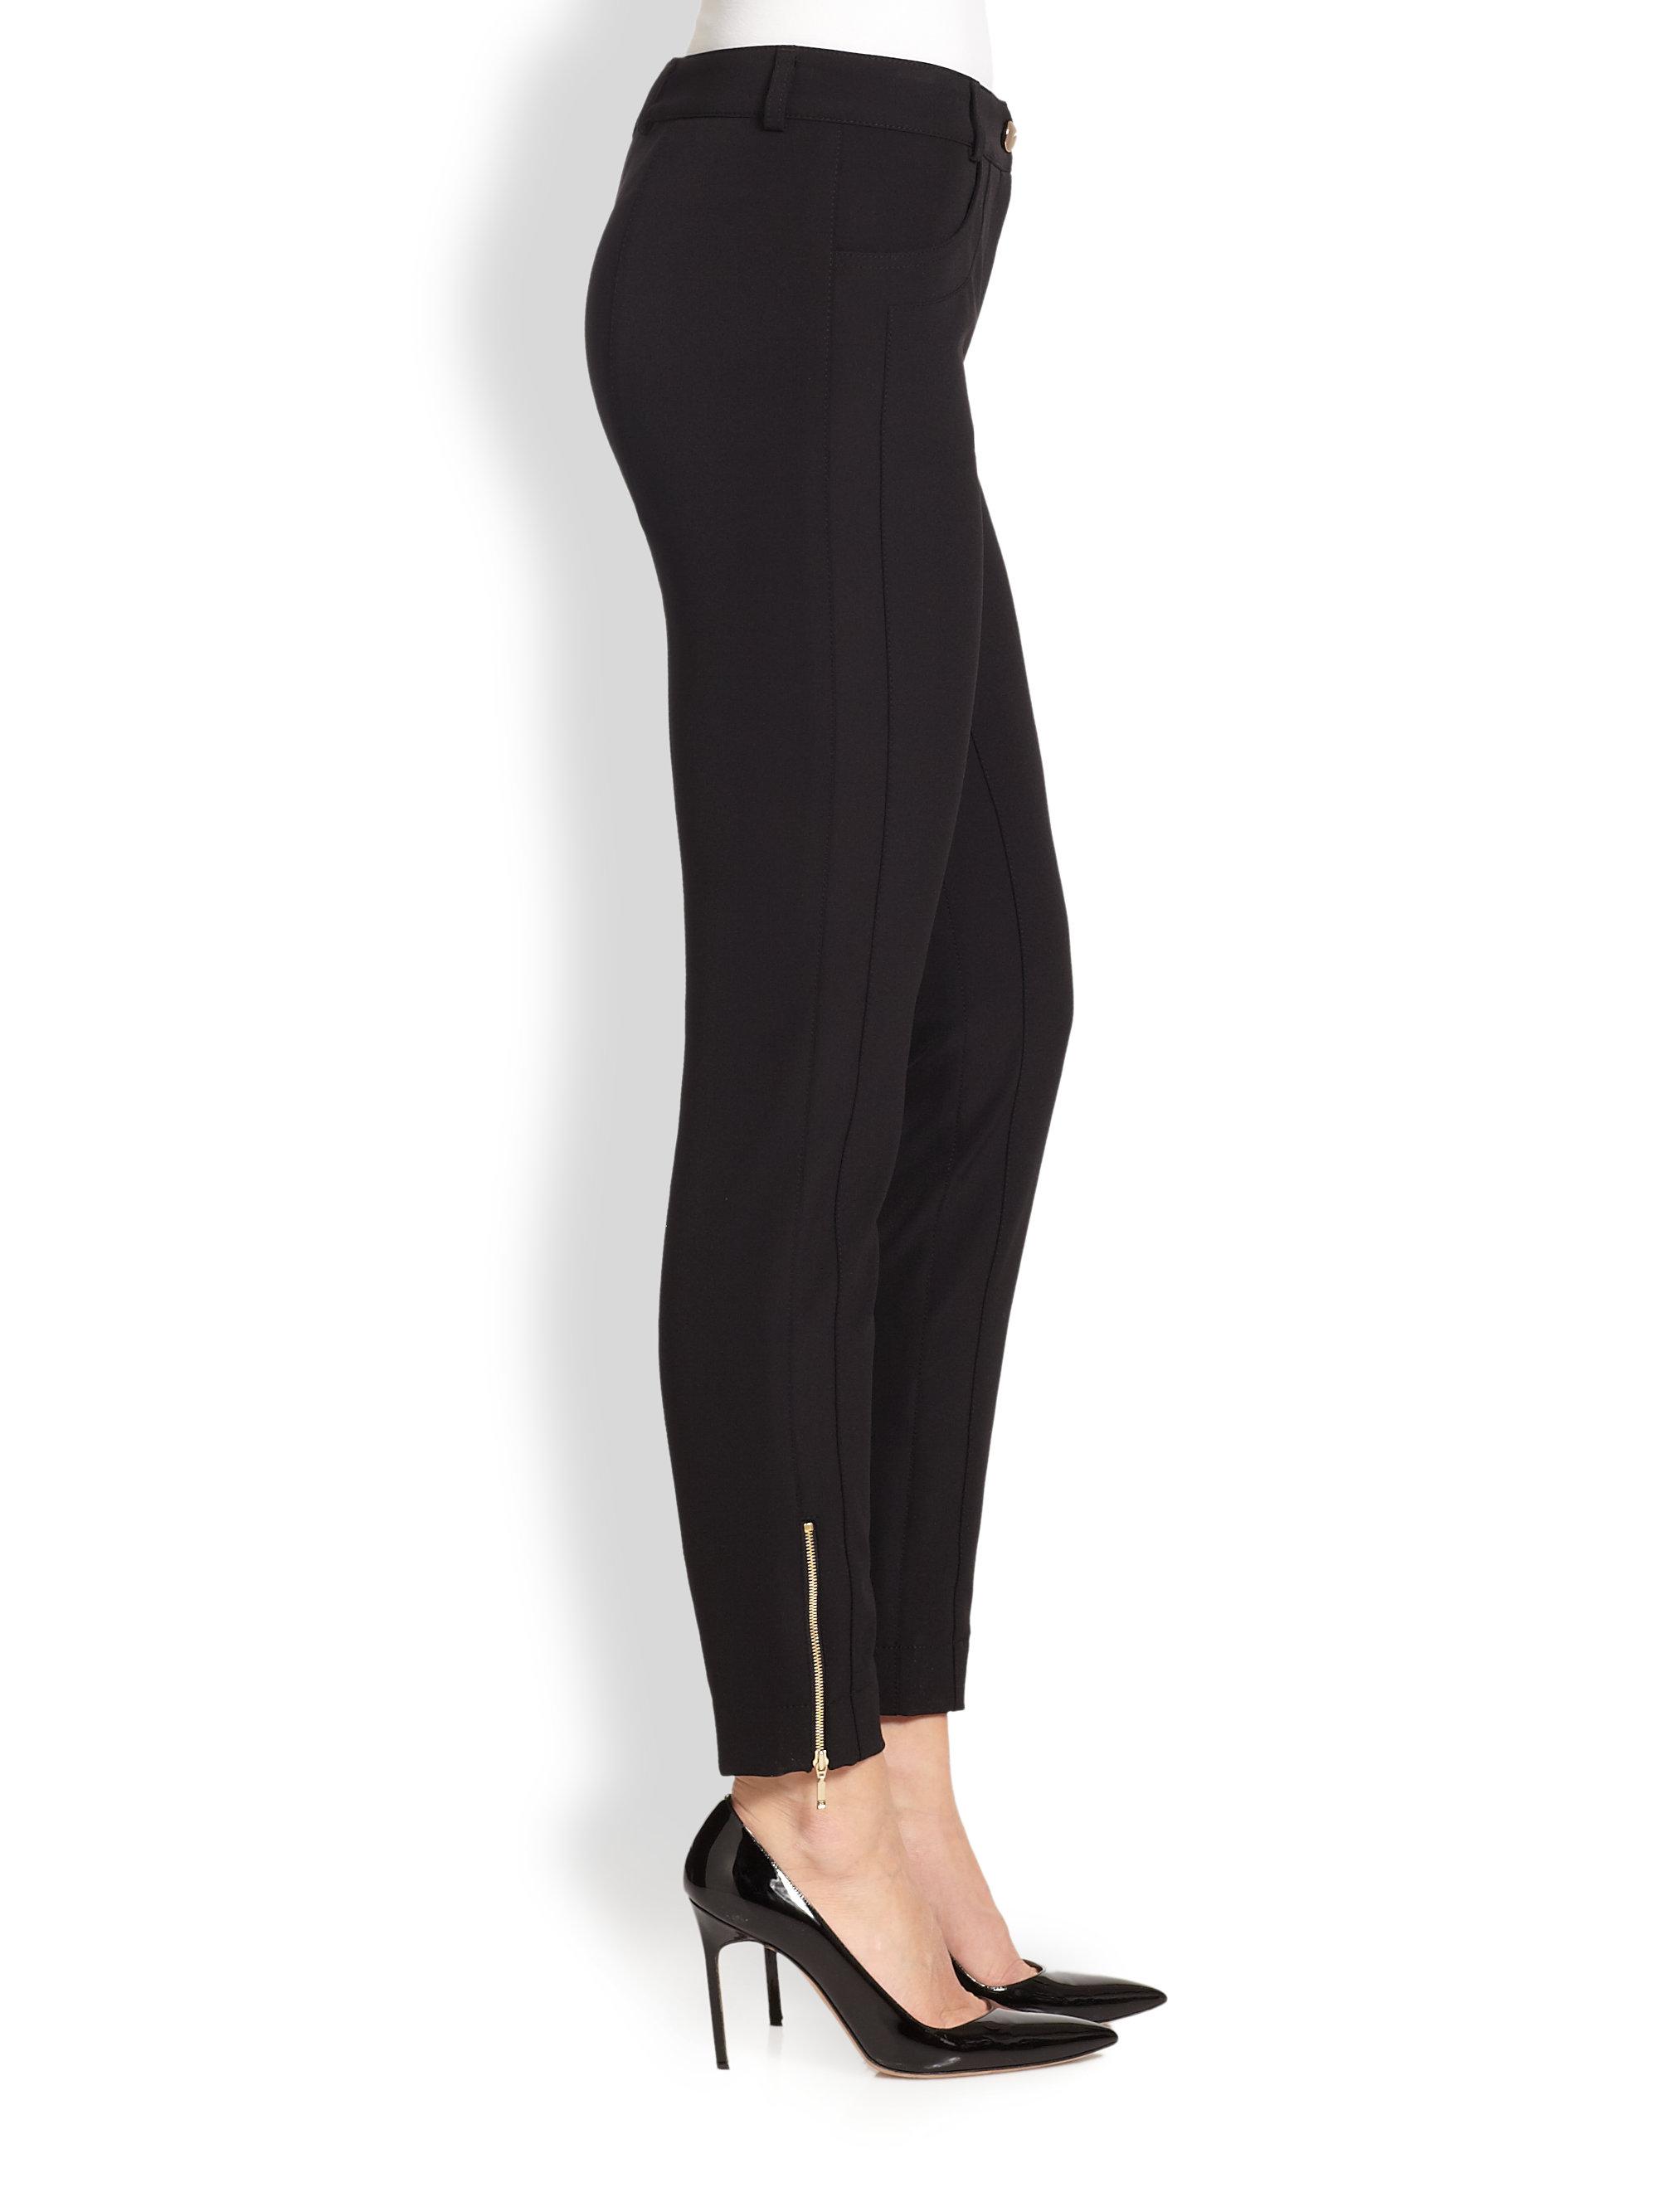 Popular Womens High Waist Faux Leather Zipper Leggings Skinny Black Sexy Slim